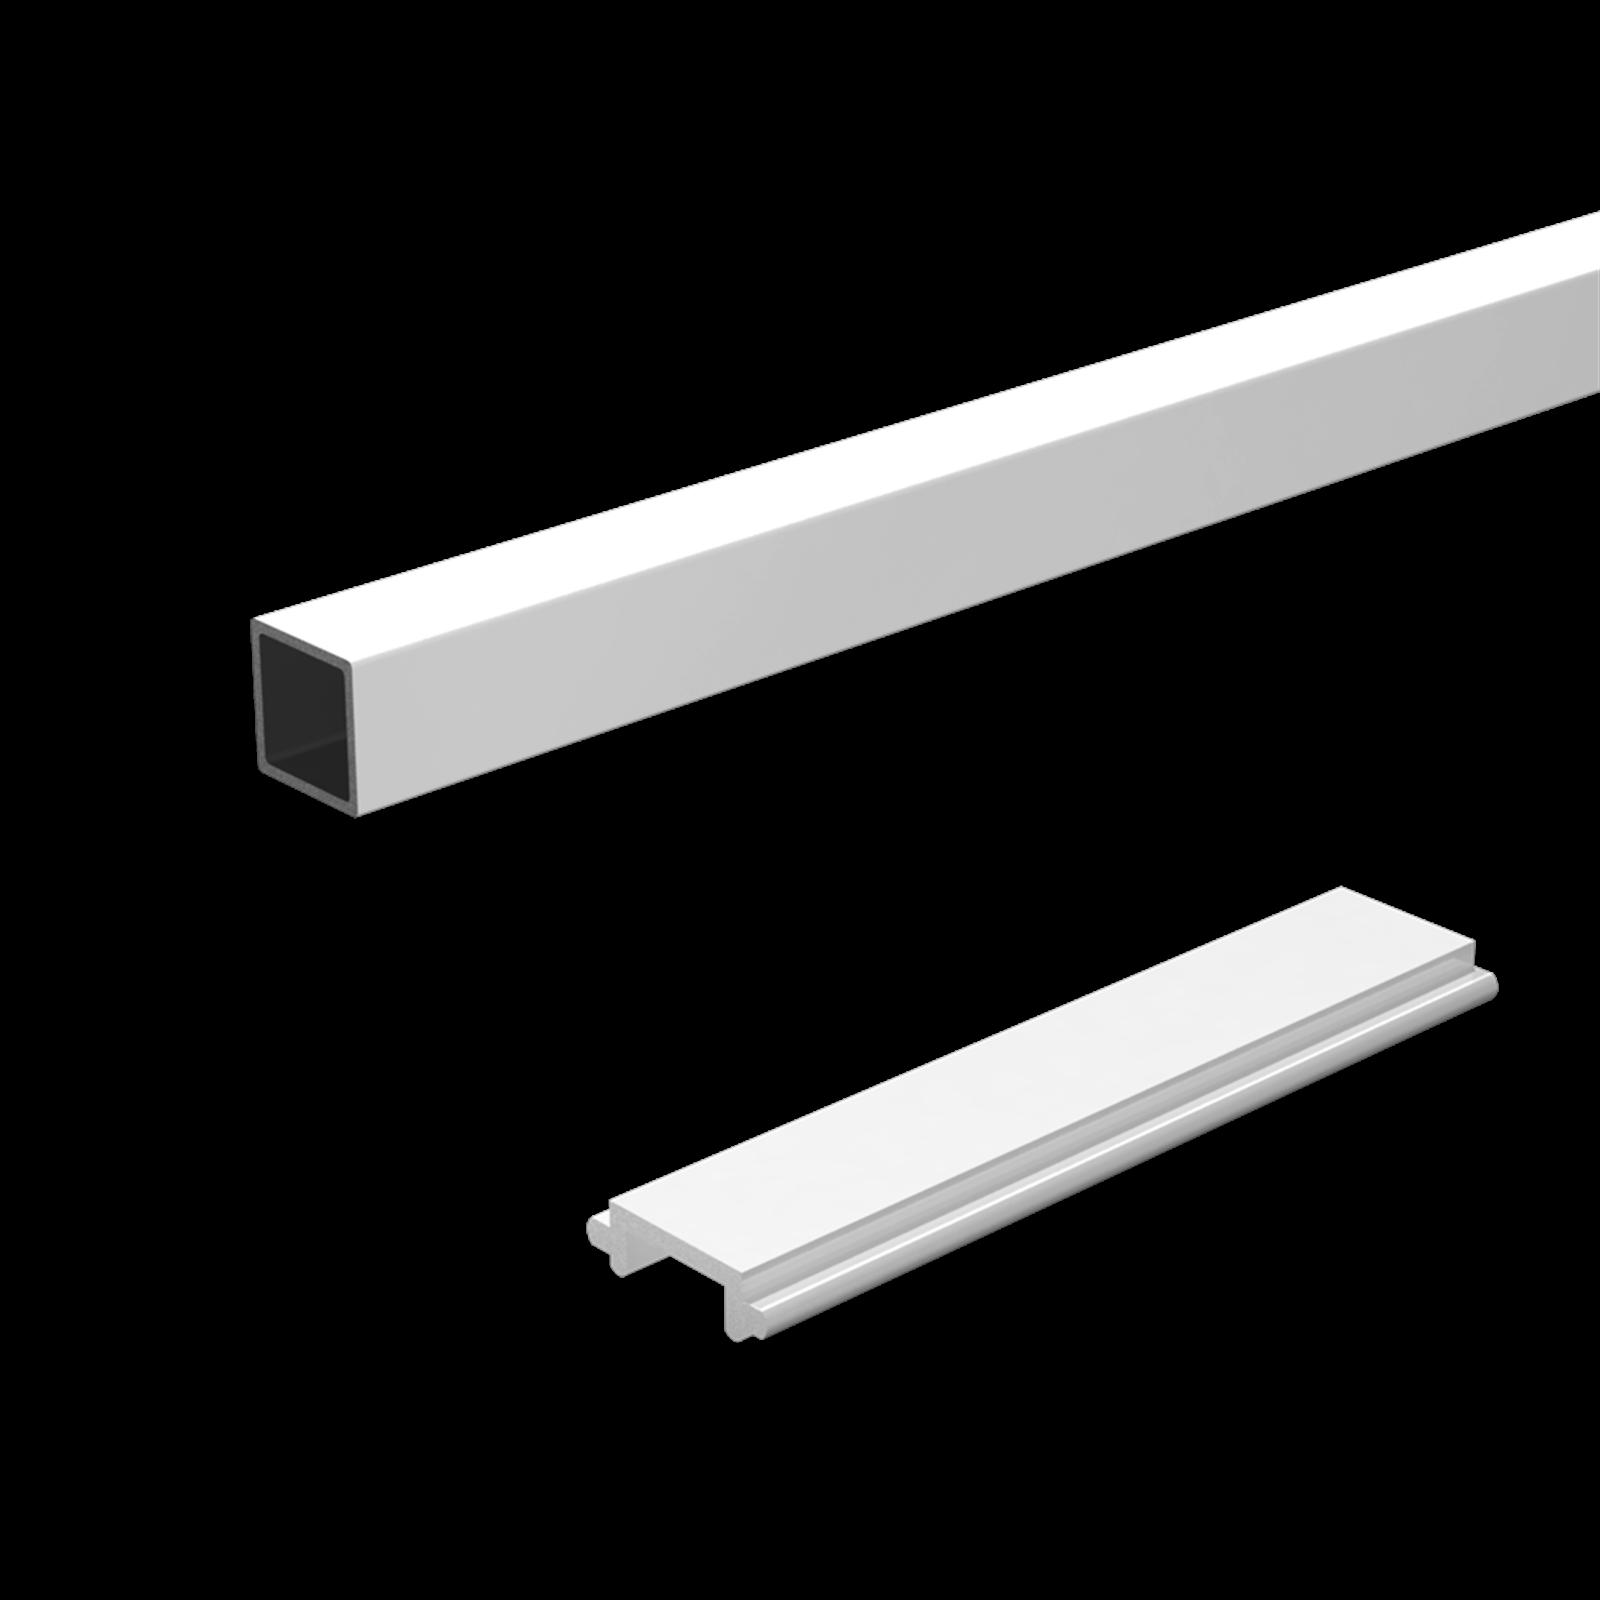 Peak 1200mm Aluminium Balustrade Standard Balusters And Spacer Kit